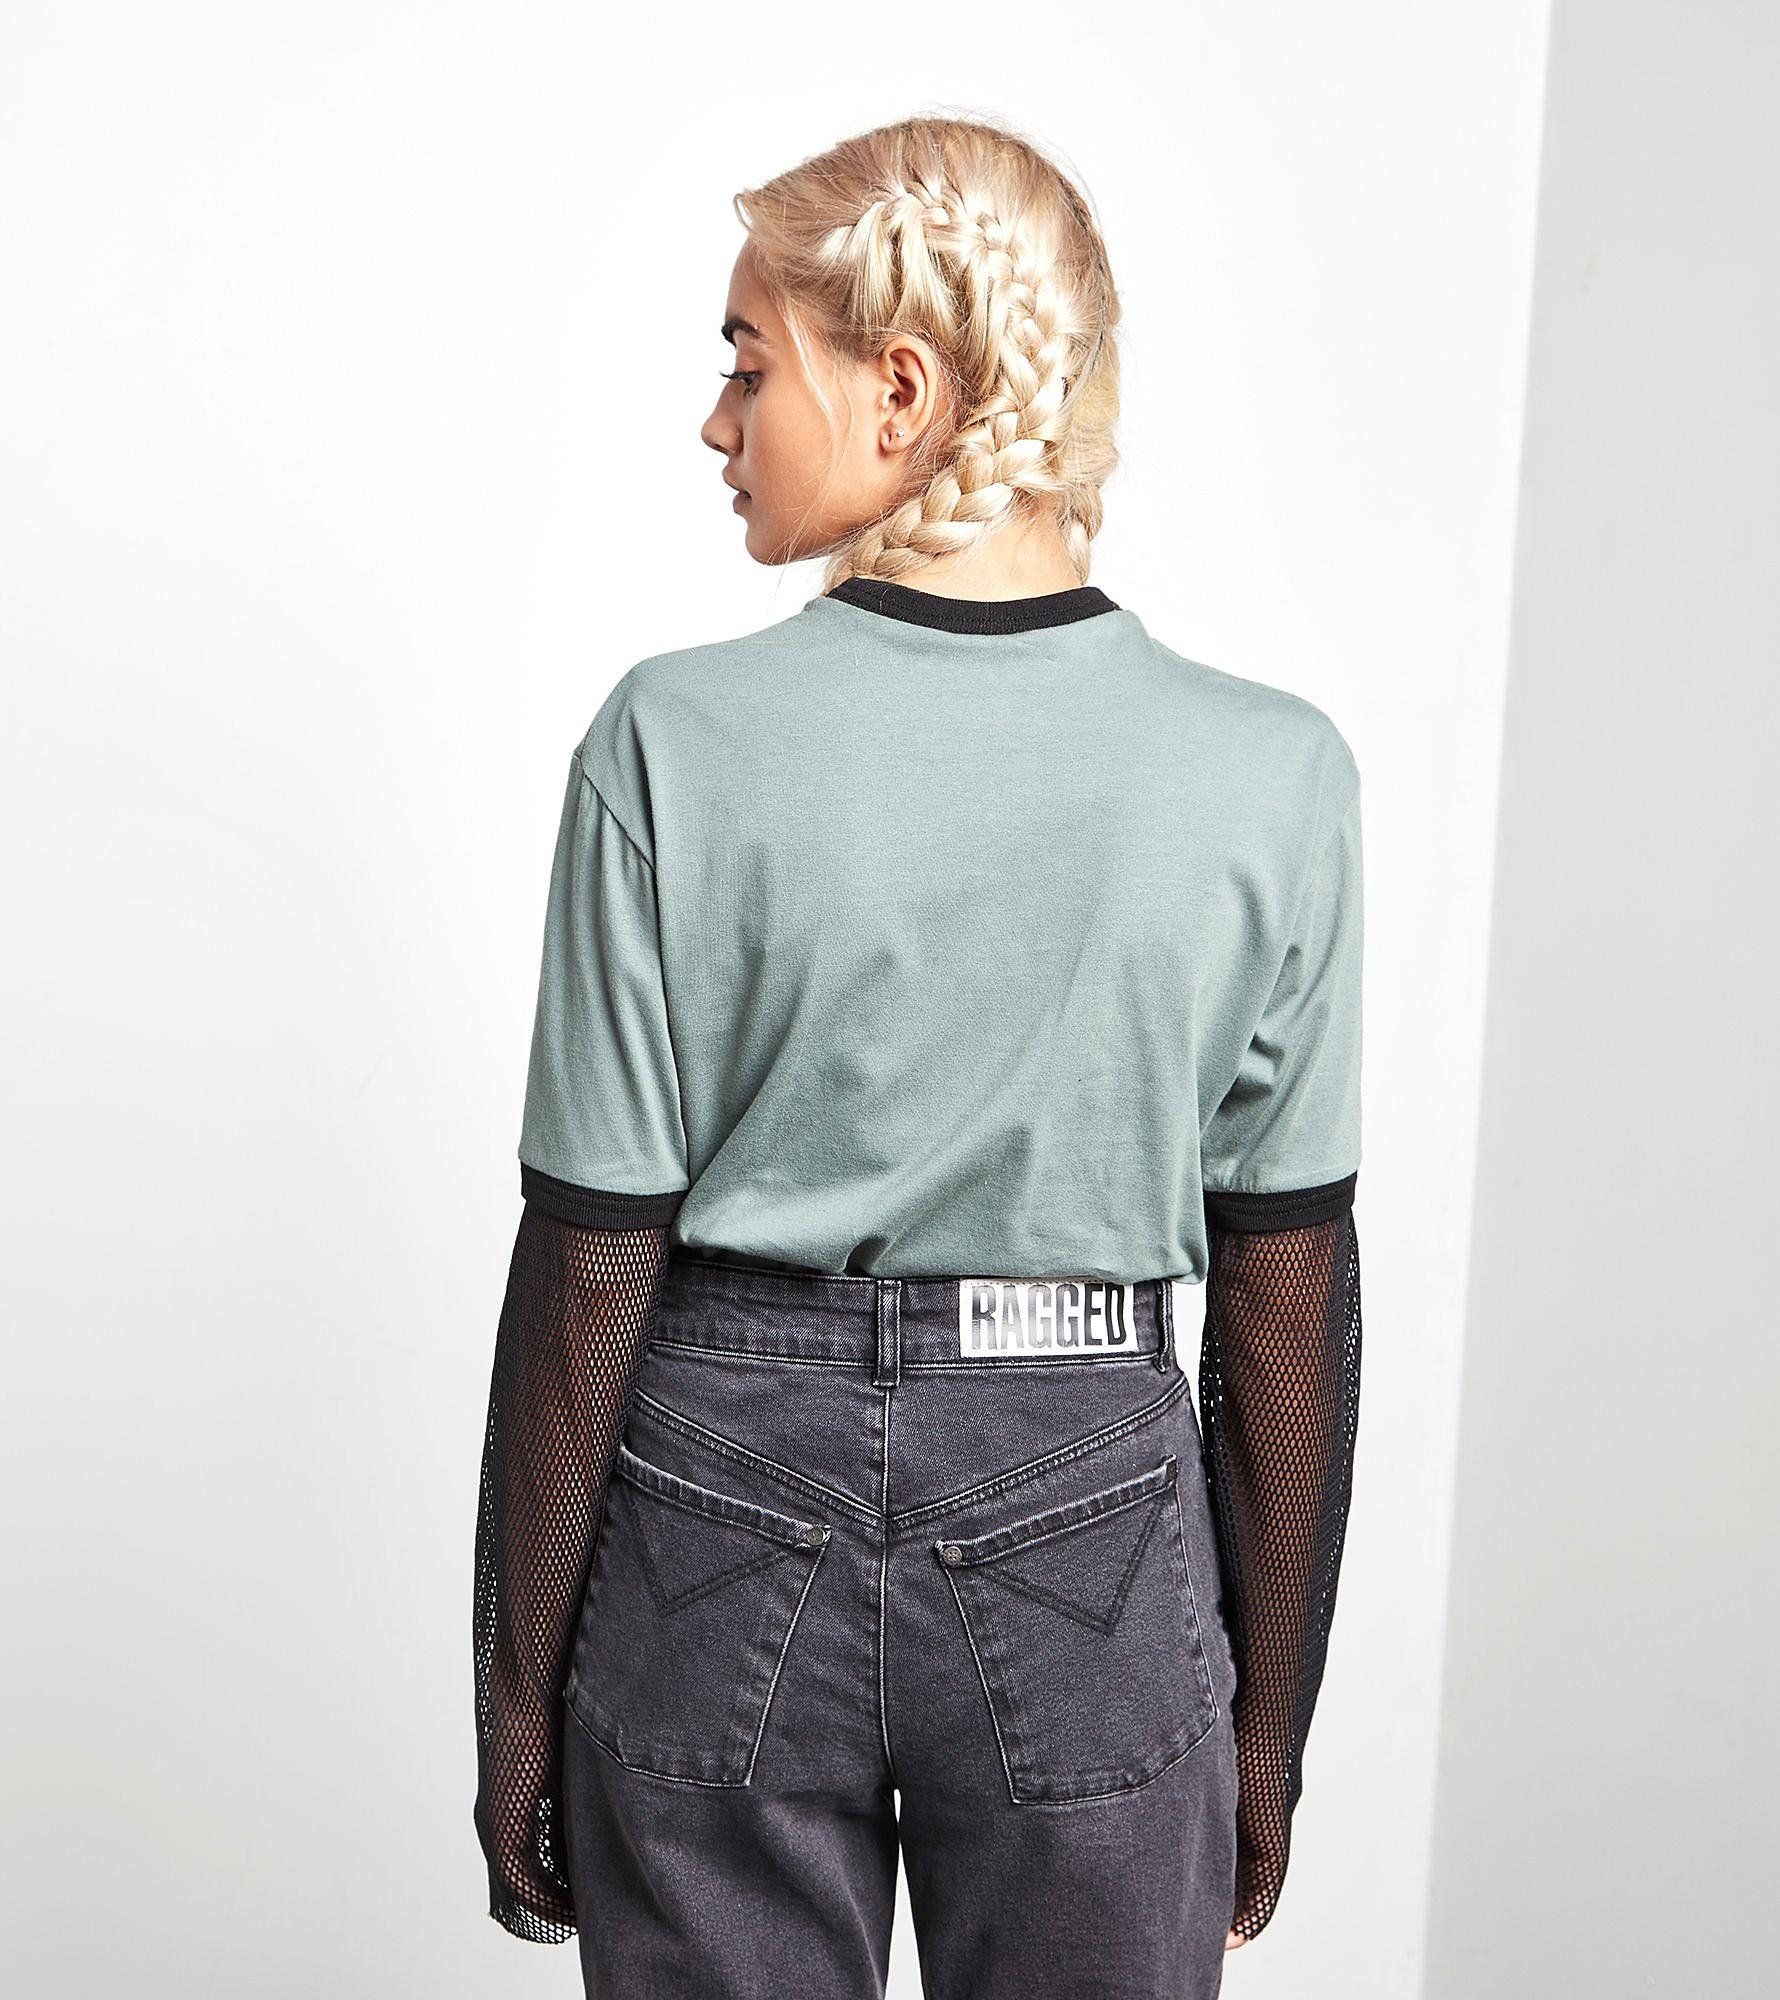 Ragged Priest Detox T-Shirt